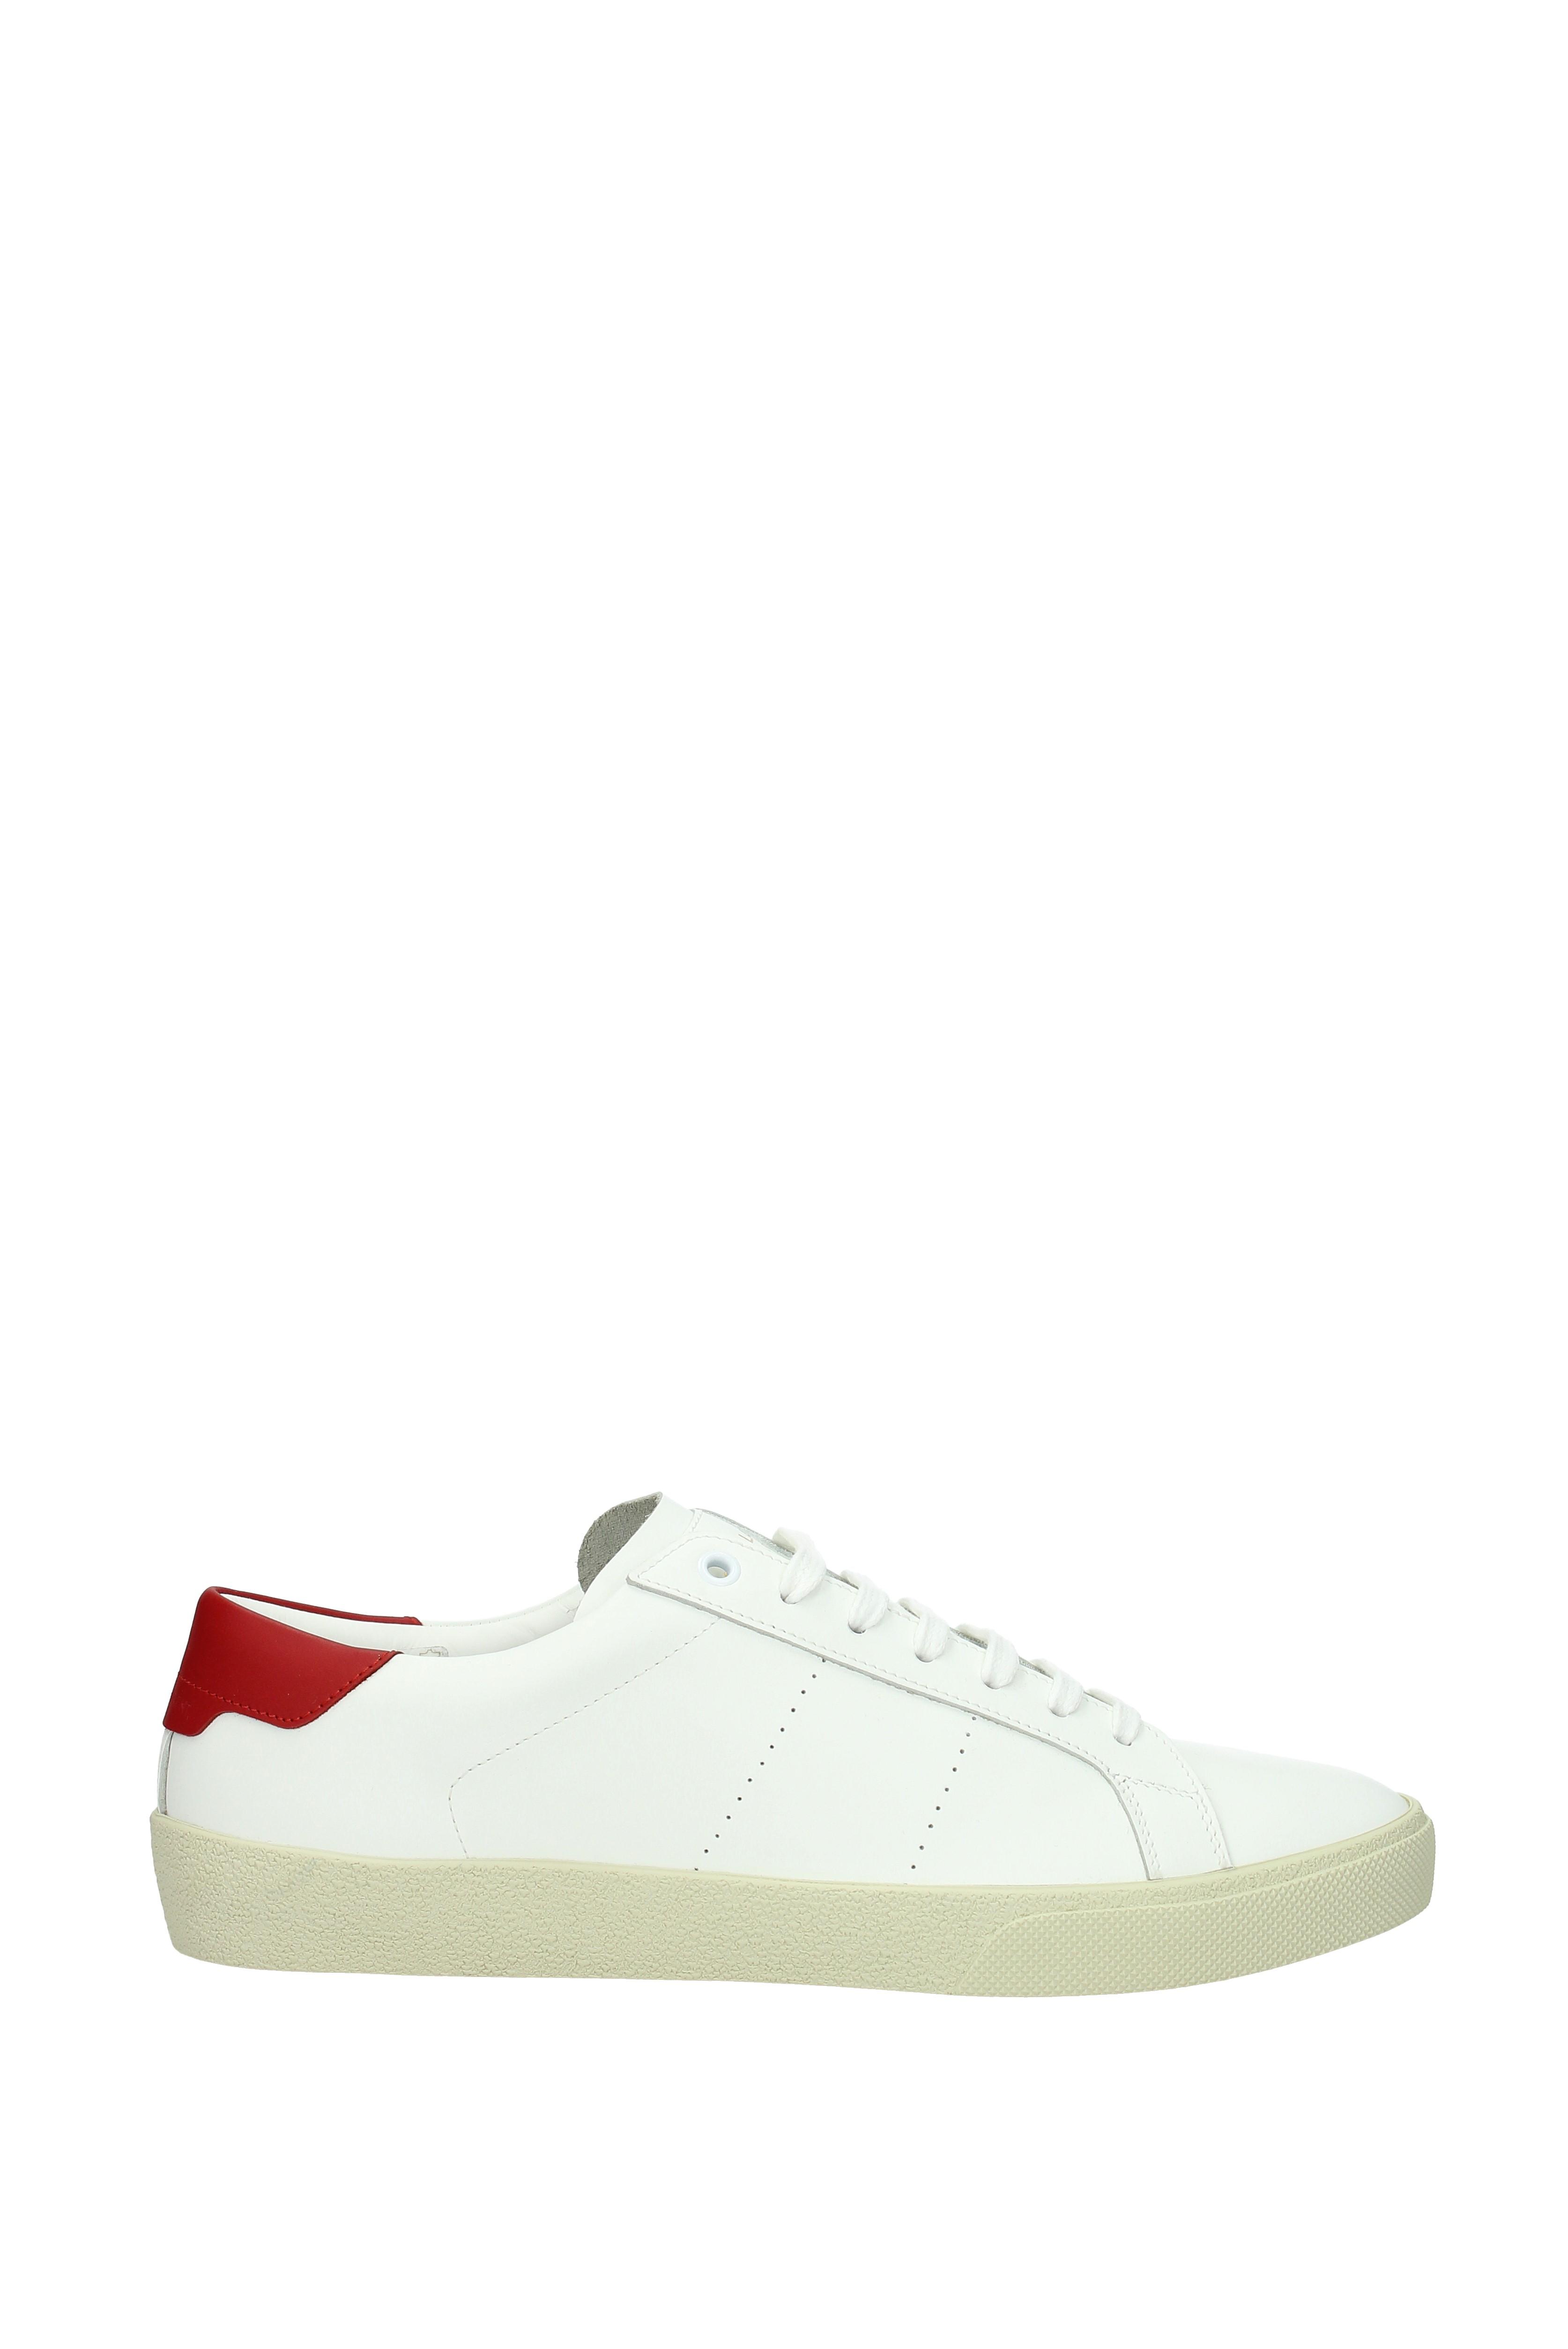 on sale 9edfd 722e9 ... New Balance Balance Balance Men s M574 Sneaker Hemp Incense 02b750 ...